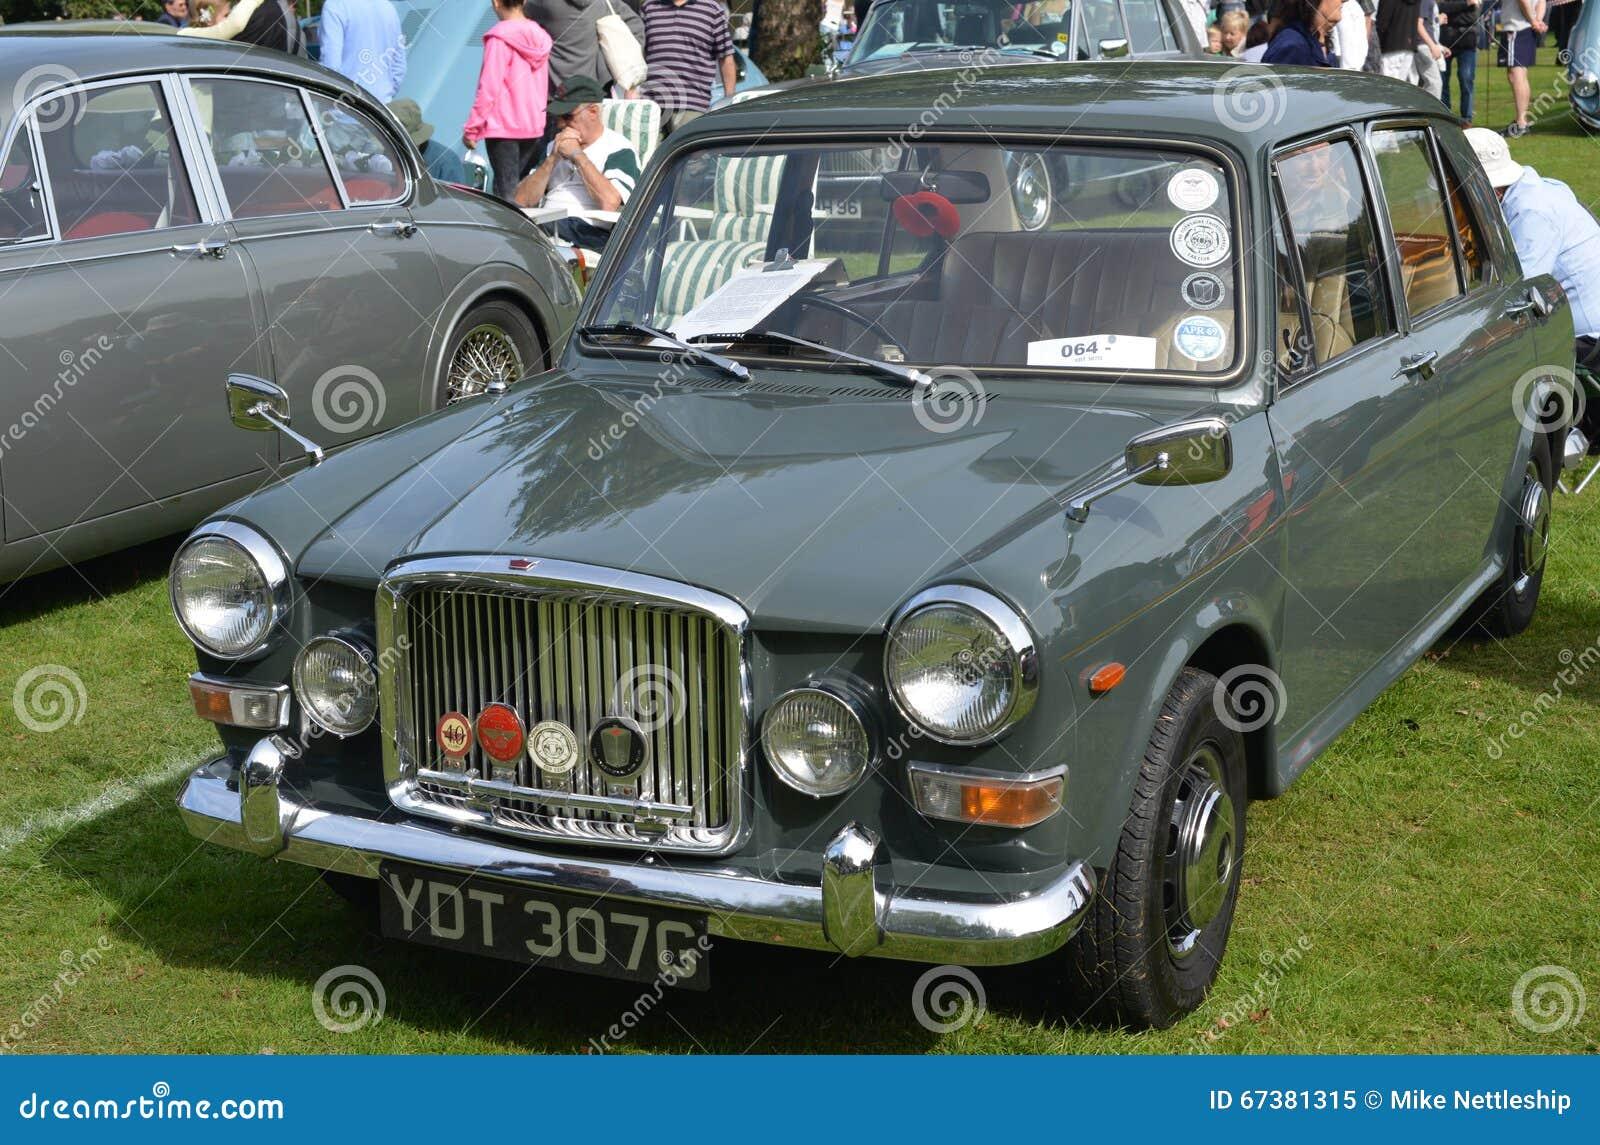 Classic Car Bumpers : Austin riley classic vintage car editorial image